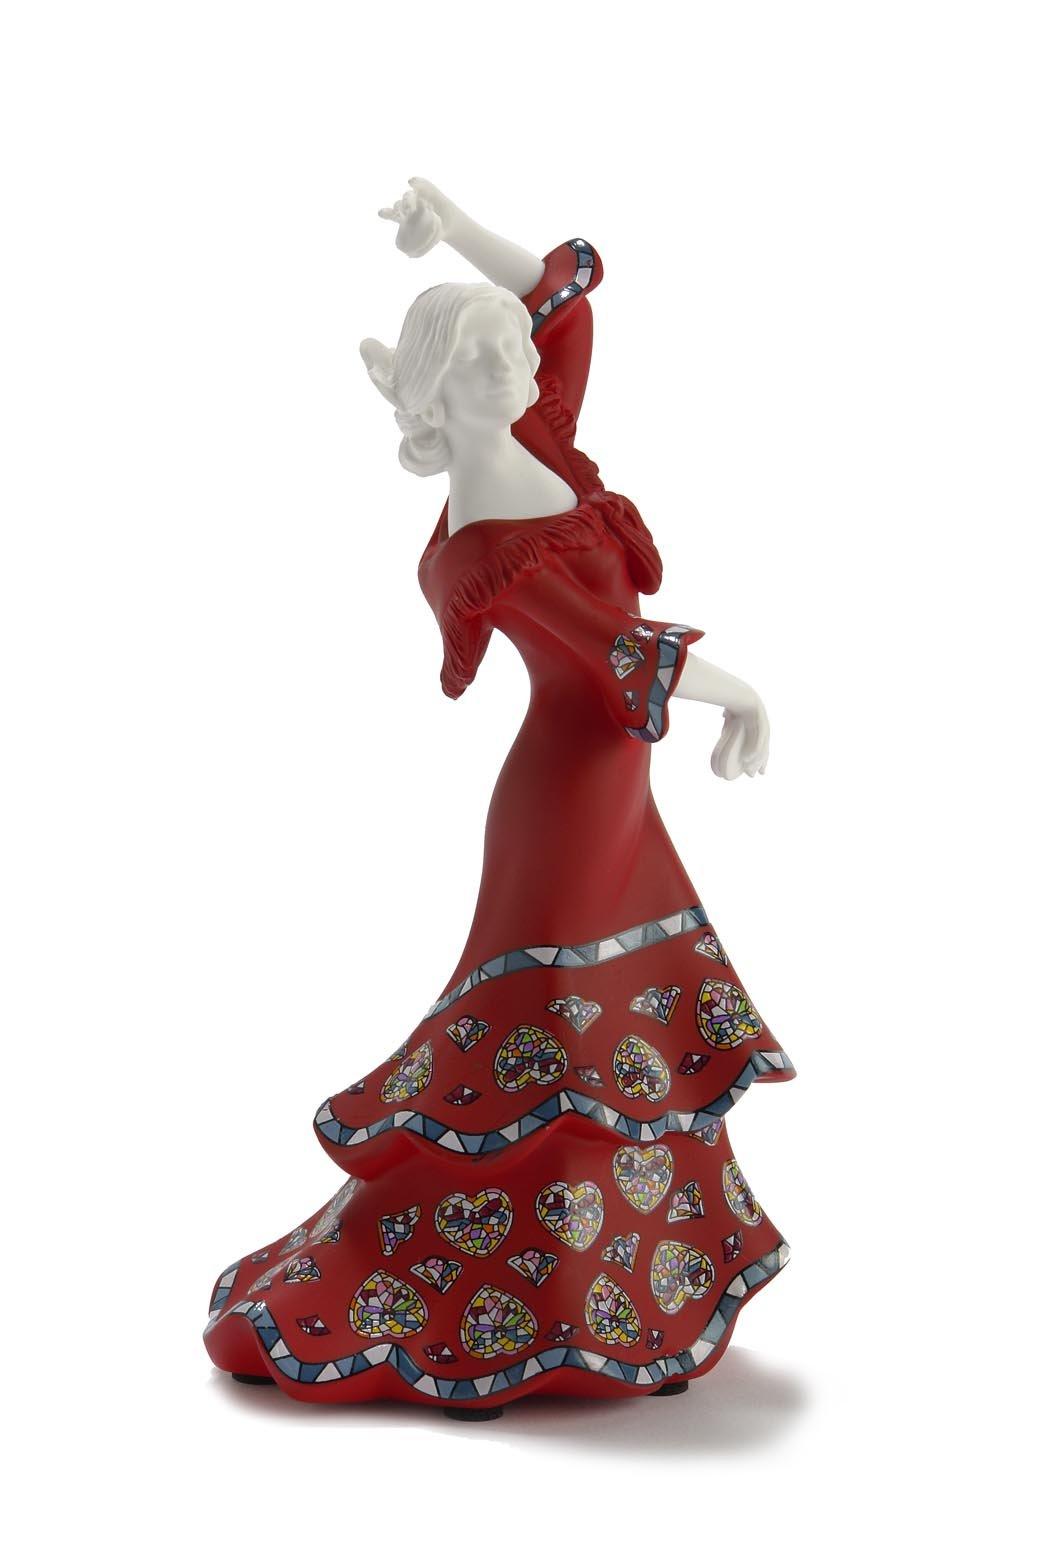 Nadal Figura Decorativa Gracia española, Resina, Multicolor, 6.00x7.20x15.00 cm: Amazon.es: Hogar